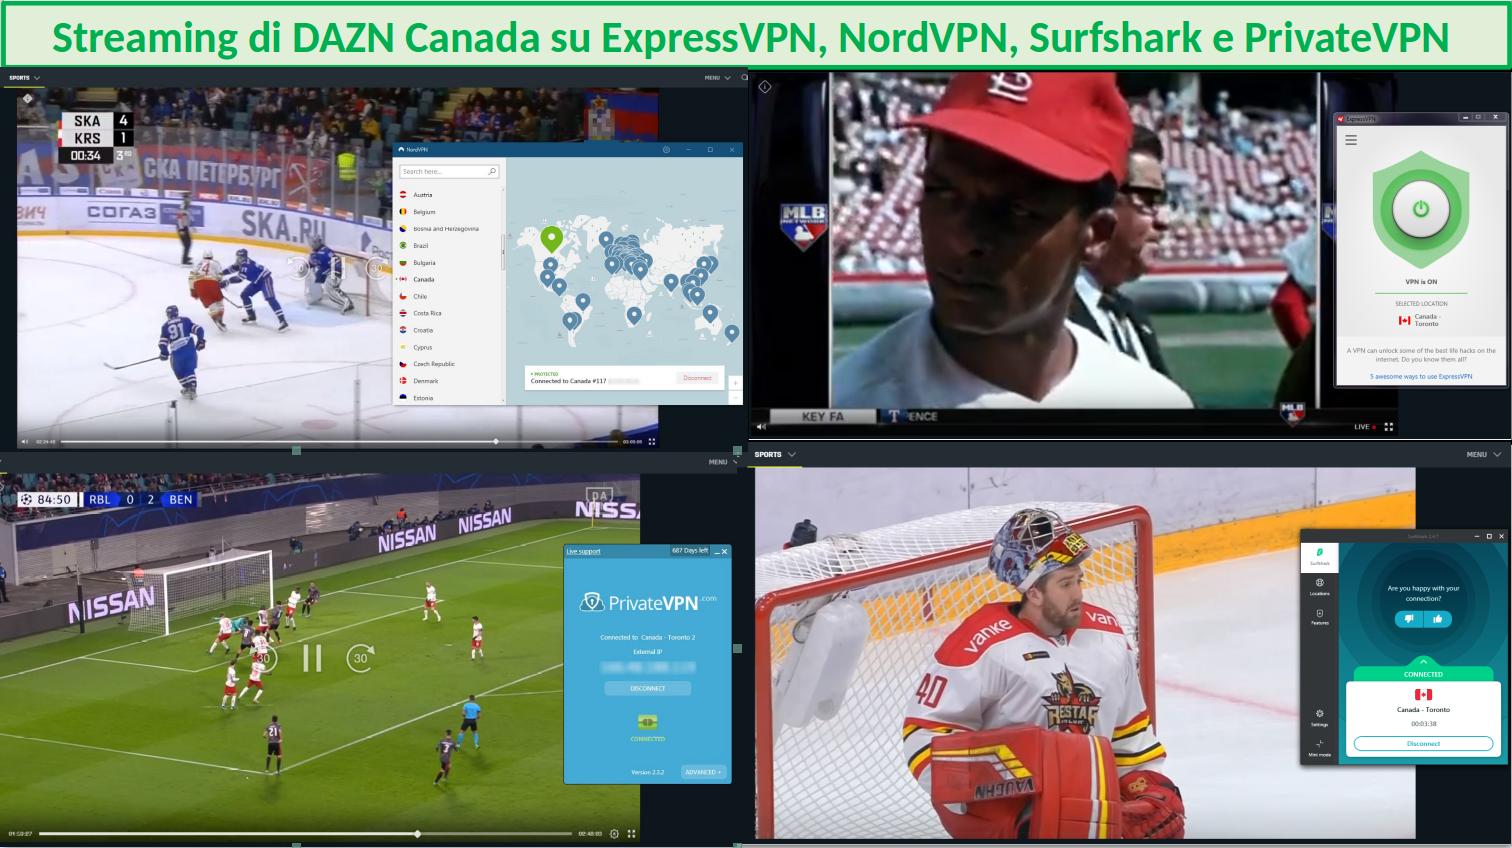 Streaming DAZN con ExpressVPN, NordVPN, SurfShark e PrivateVPN